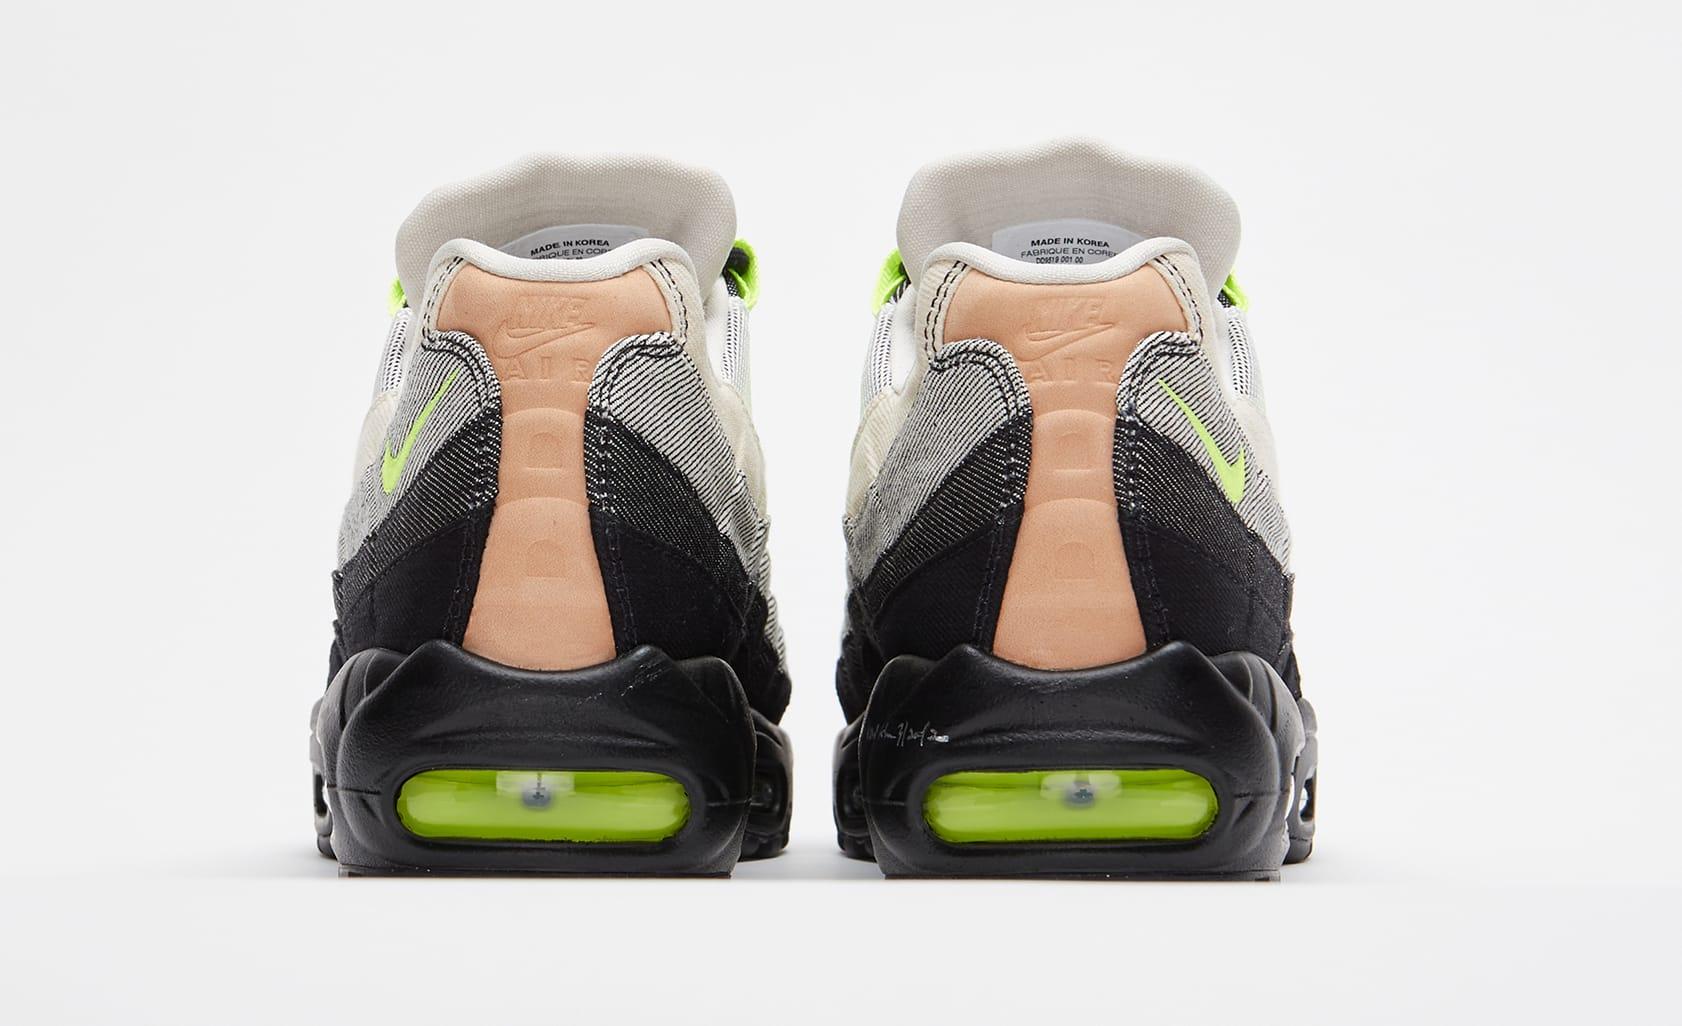 Denham x Nike Air Max 95 Heel